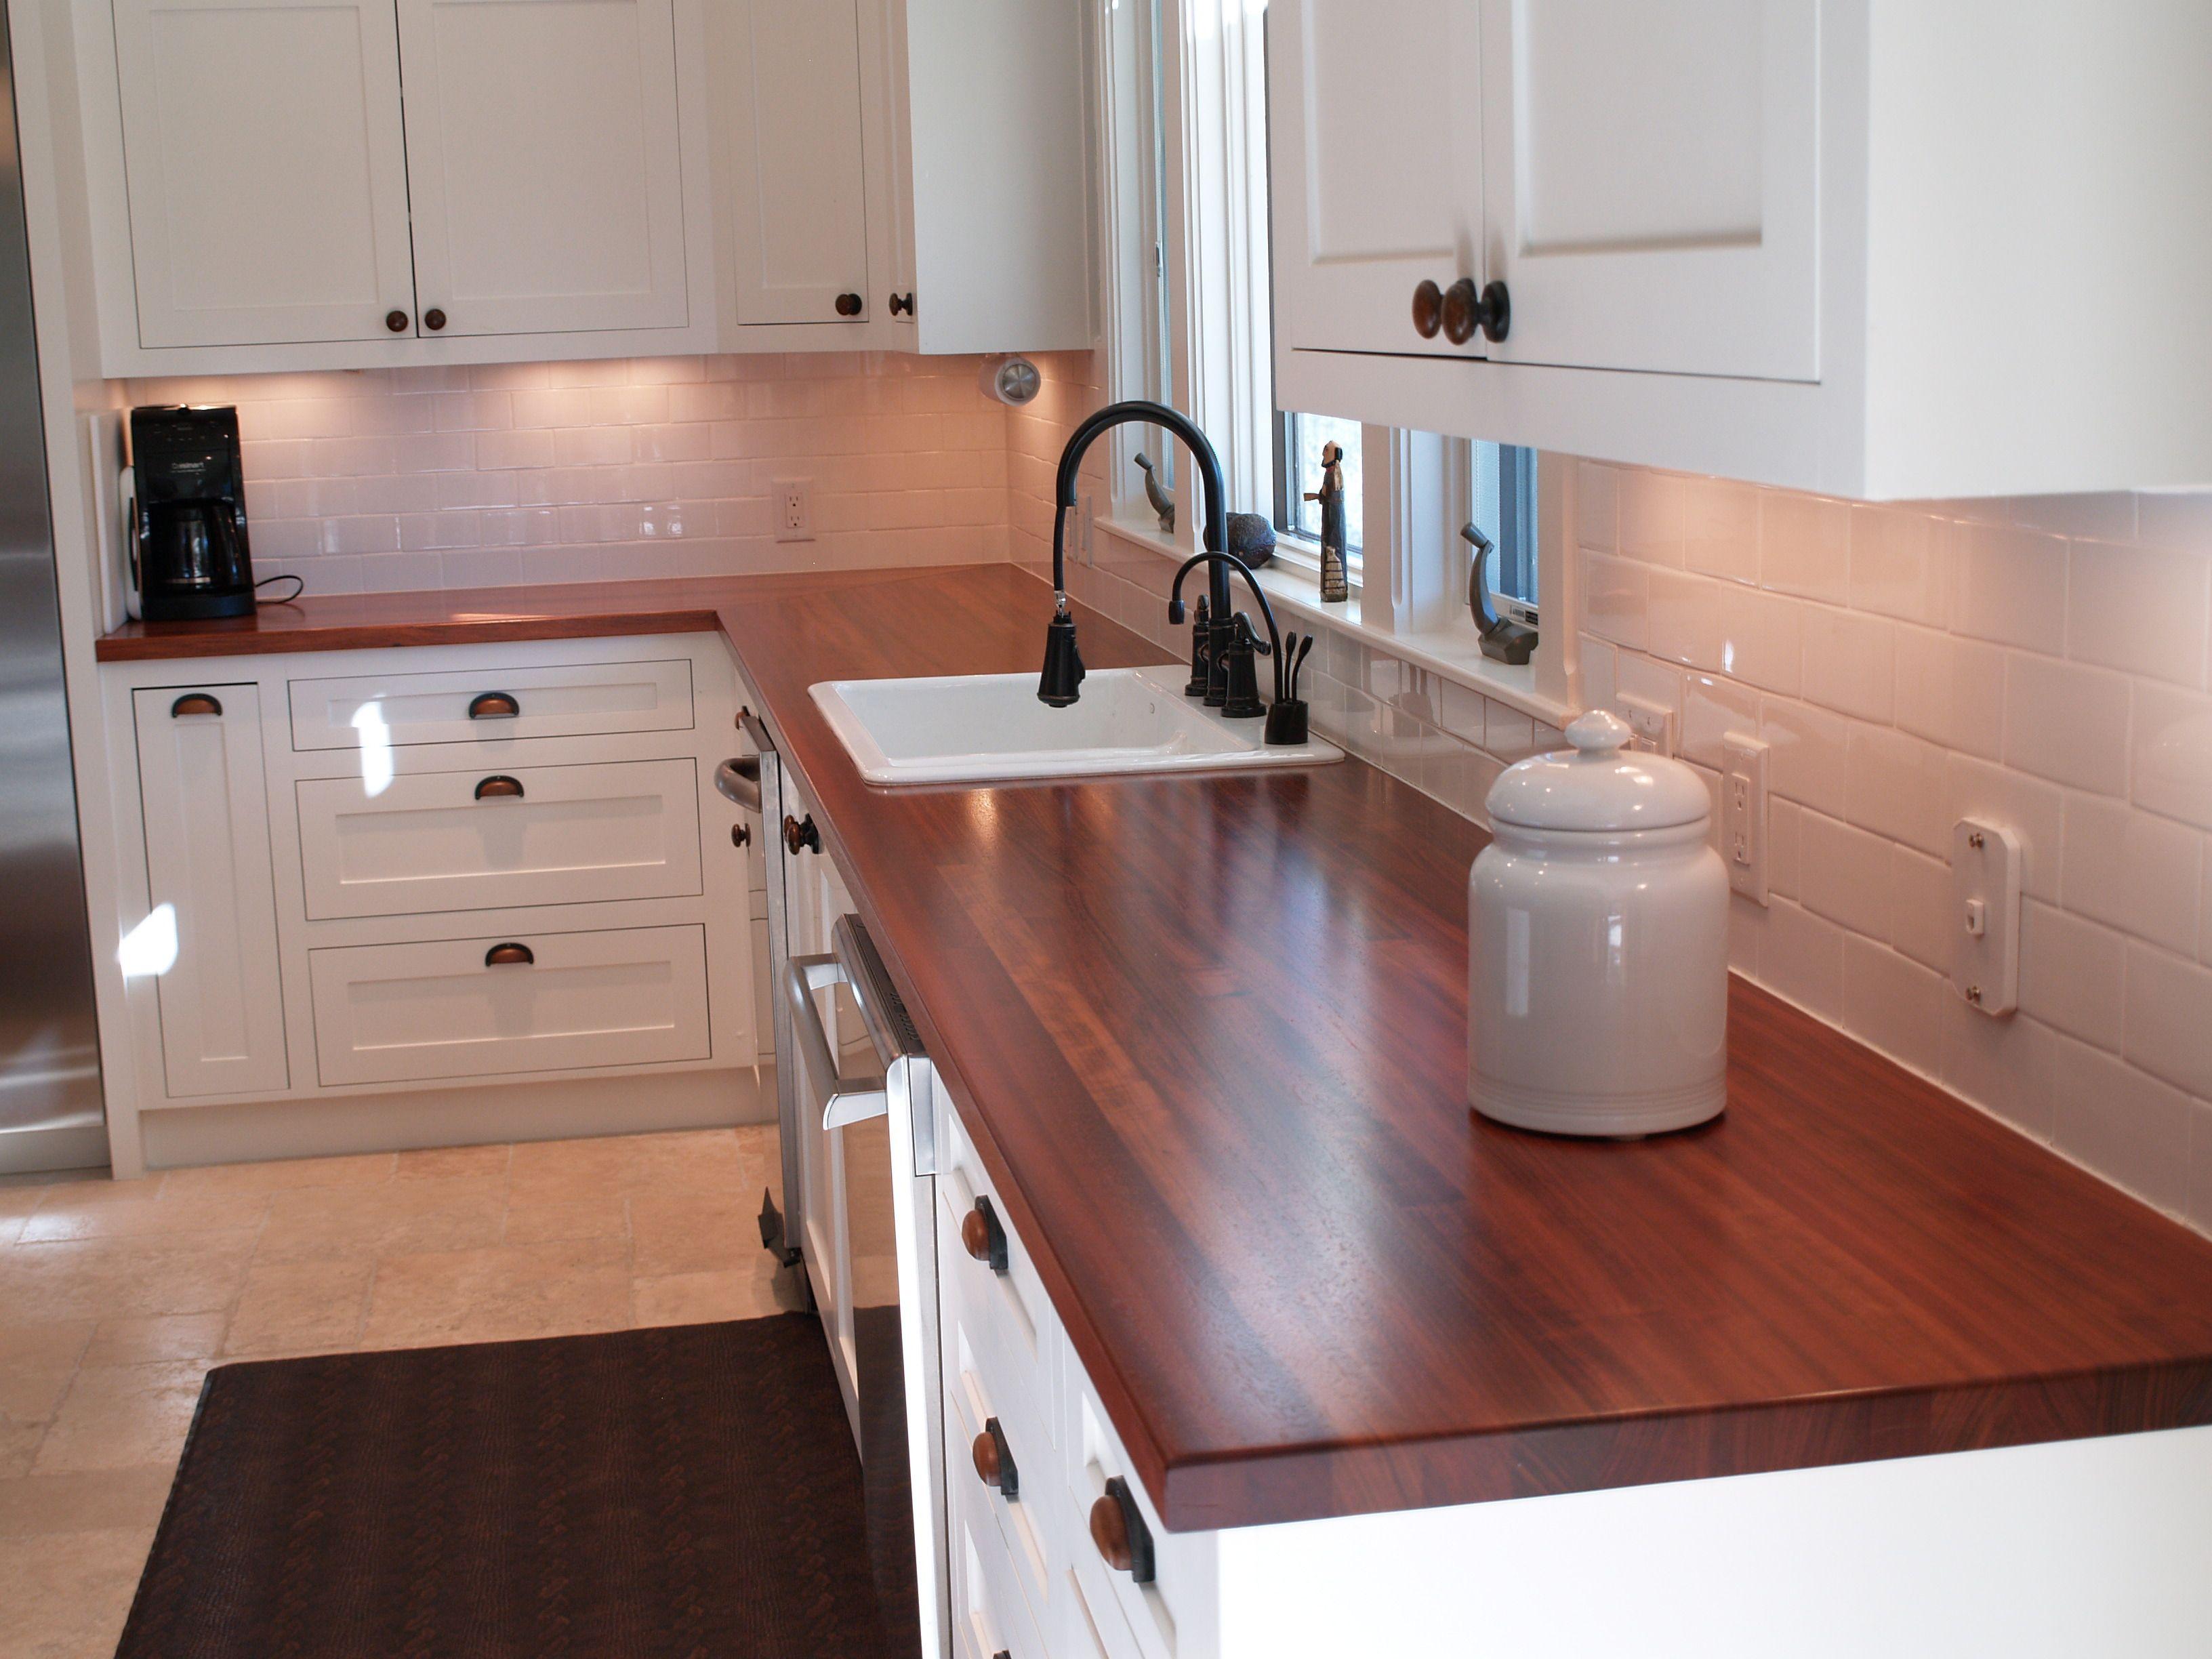 Custom Solid Wood Edge Grain Jatoba Counter Tops With Top Mount